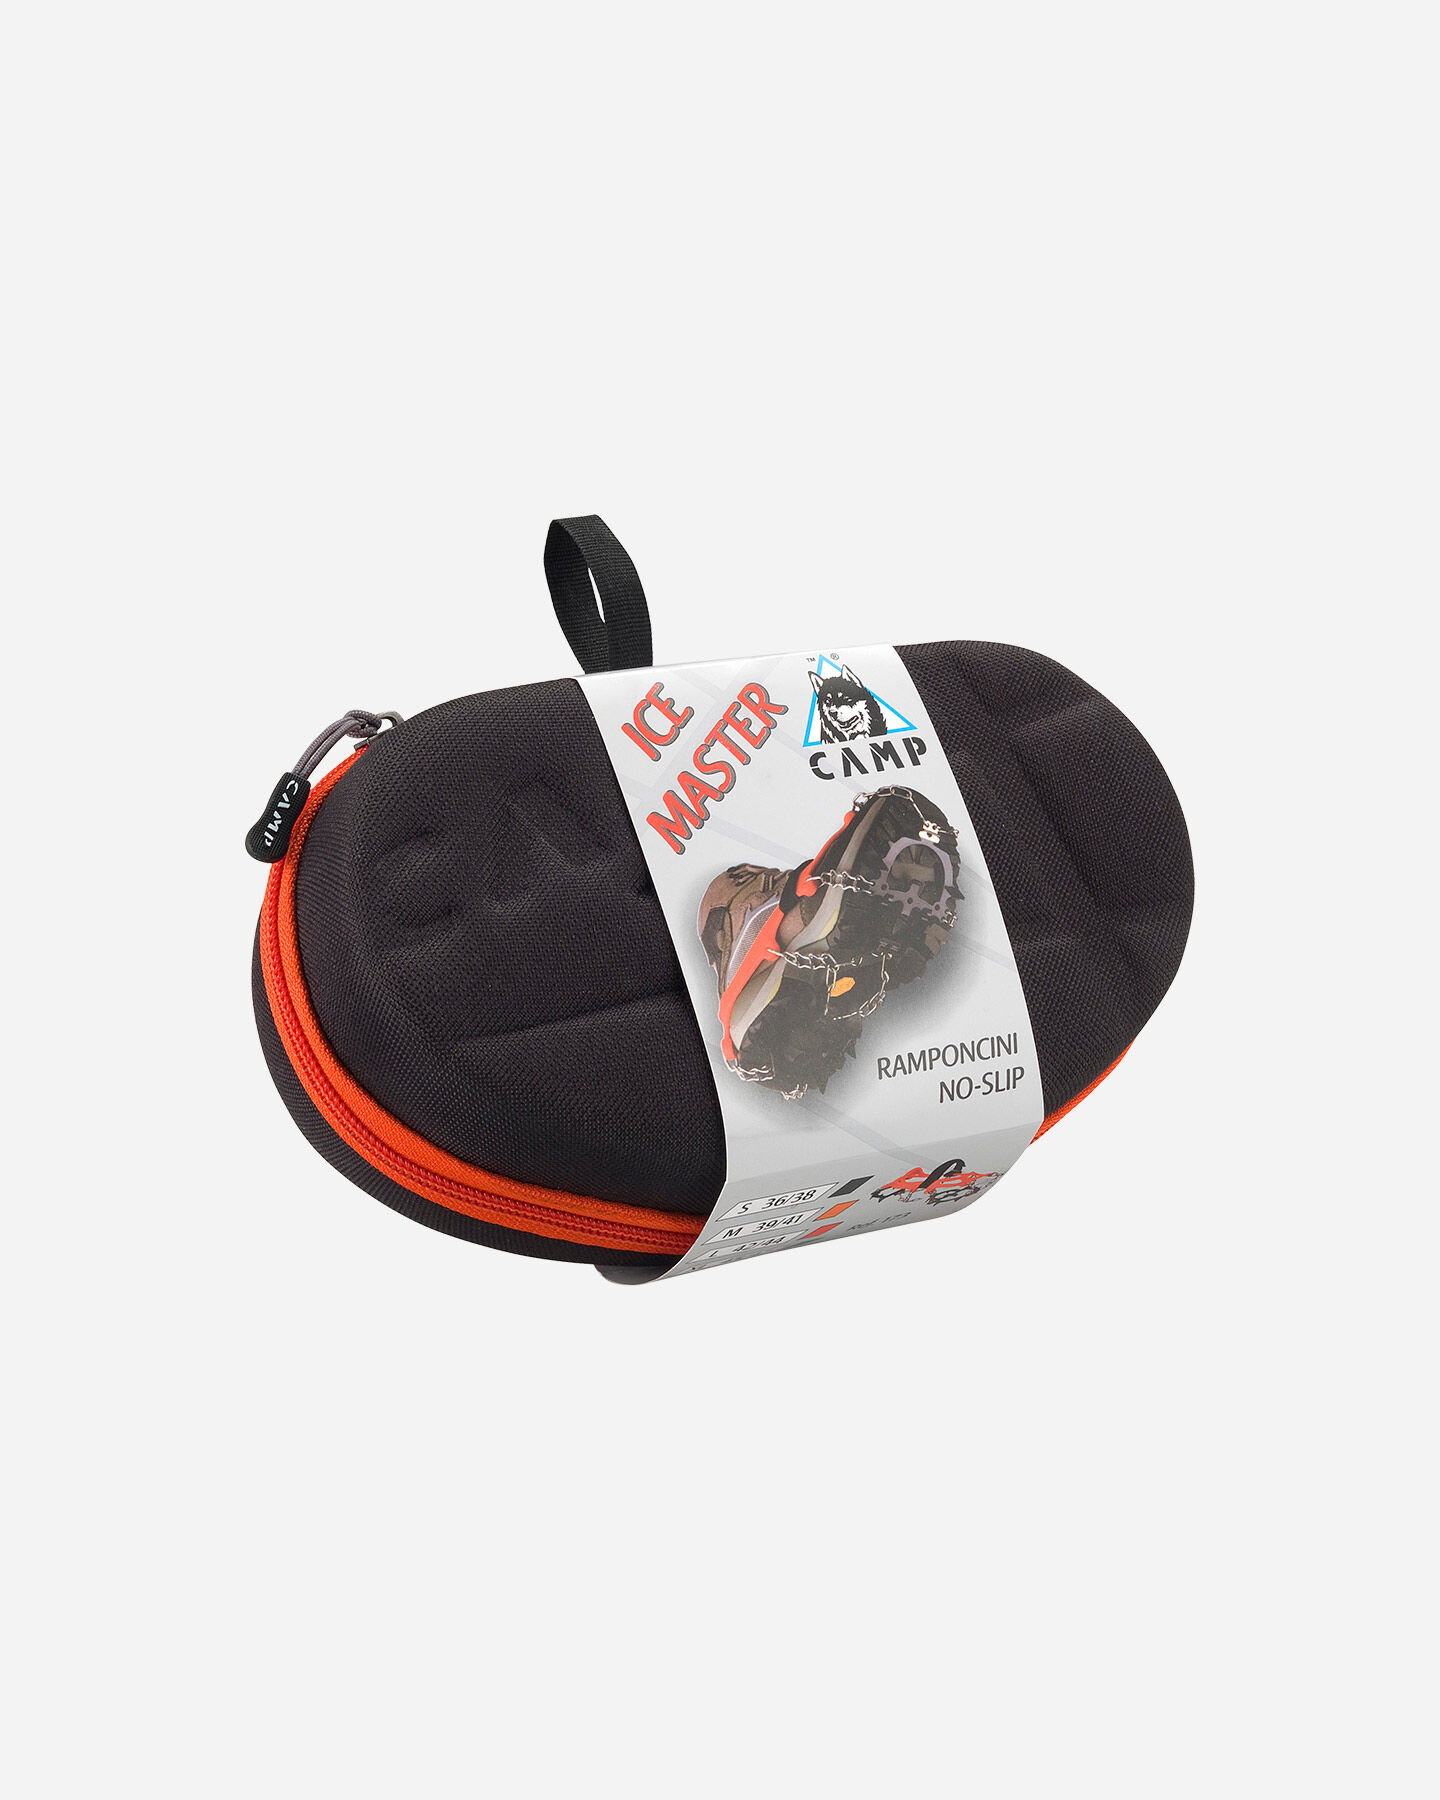 Ramponi CAMP ICE MASTER 173 S1238098 scatto 1